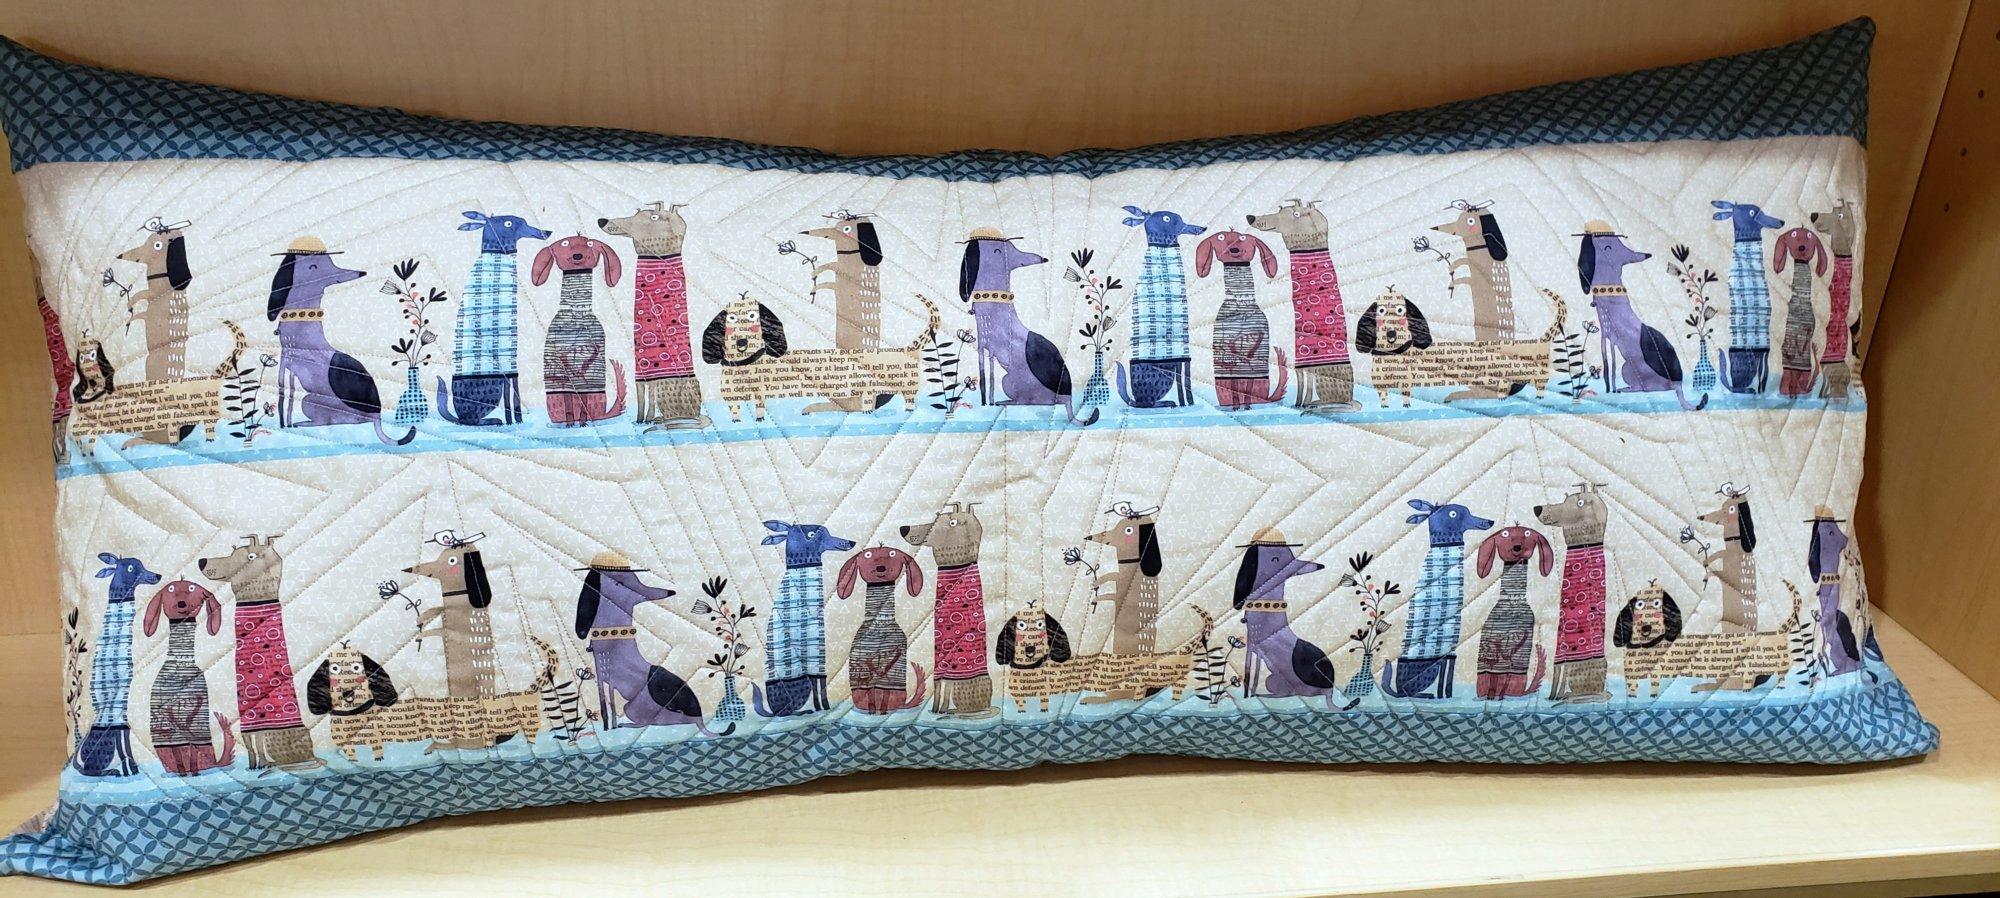 Bench Pillow Kit - It's Raining Dogs